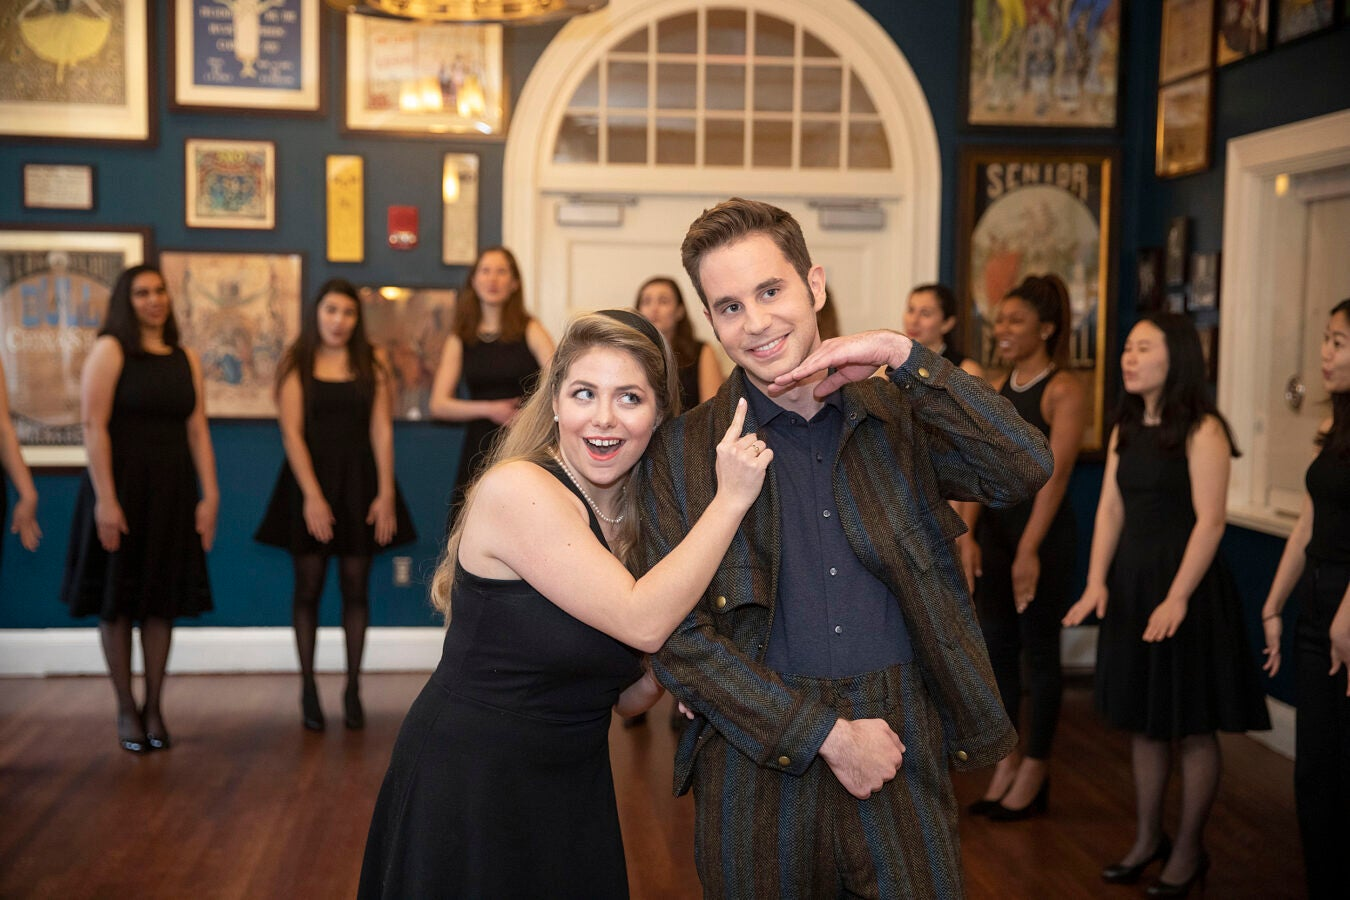 Ben Platt posing with a Harvard student.